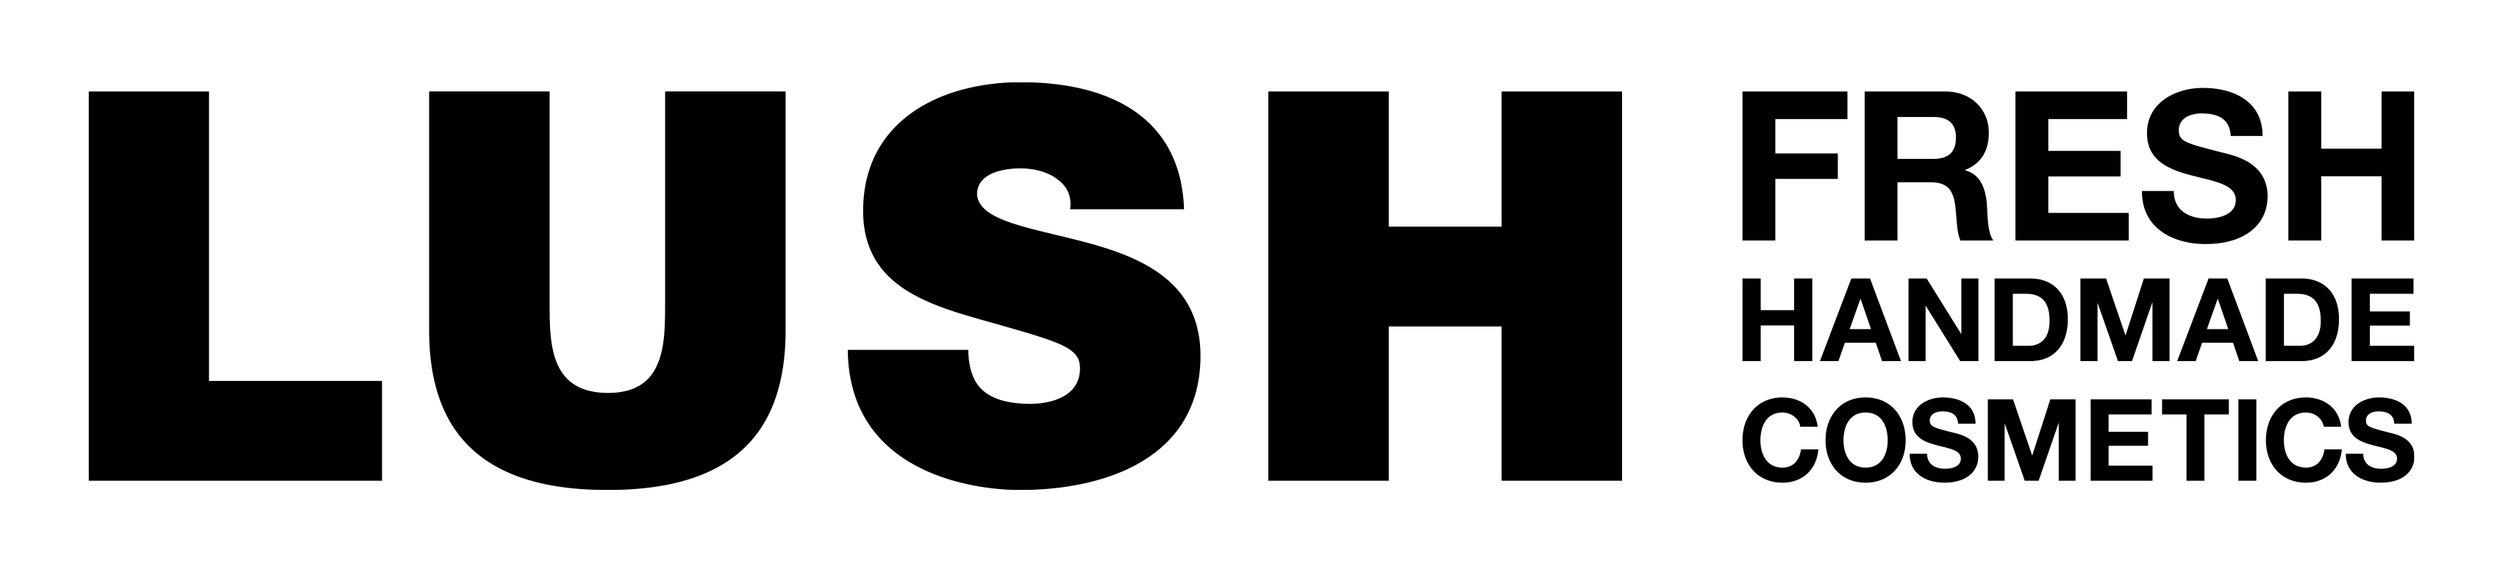 Lush_Logo_New_2014.jpg